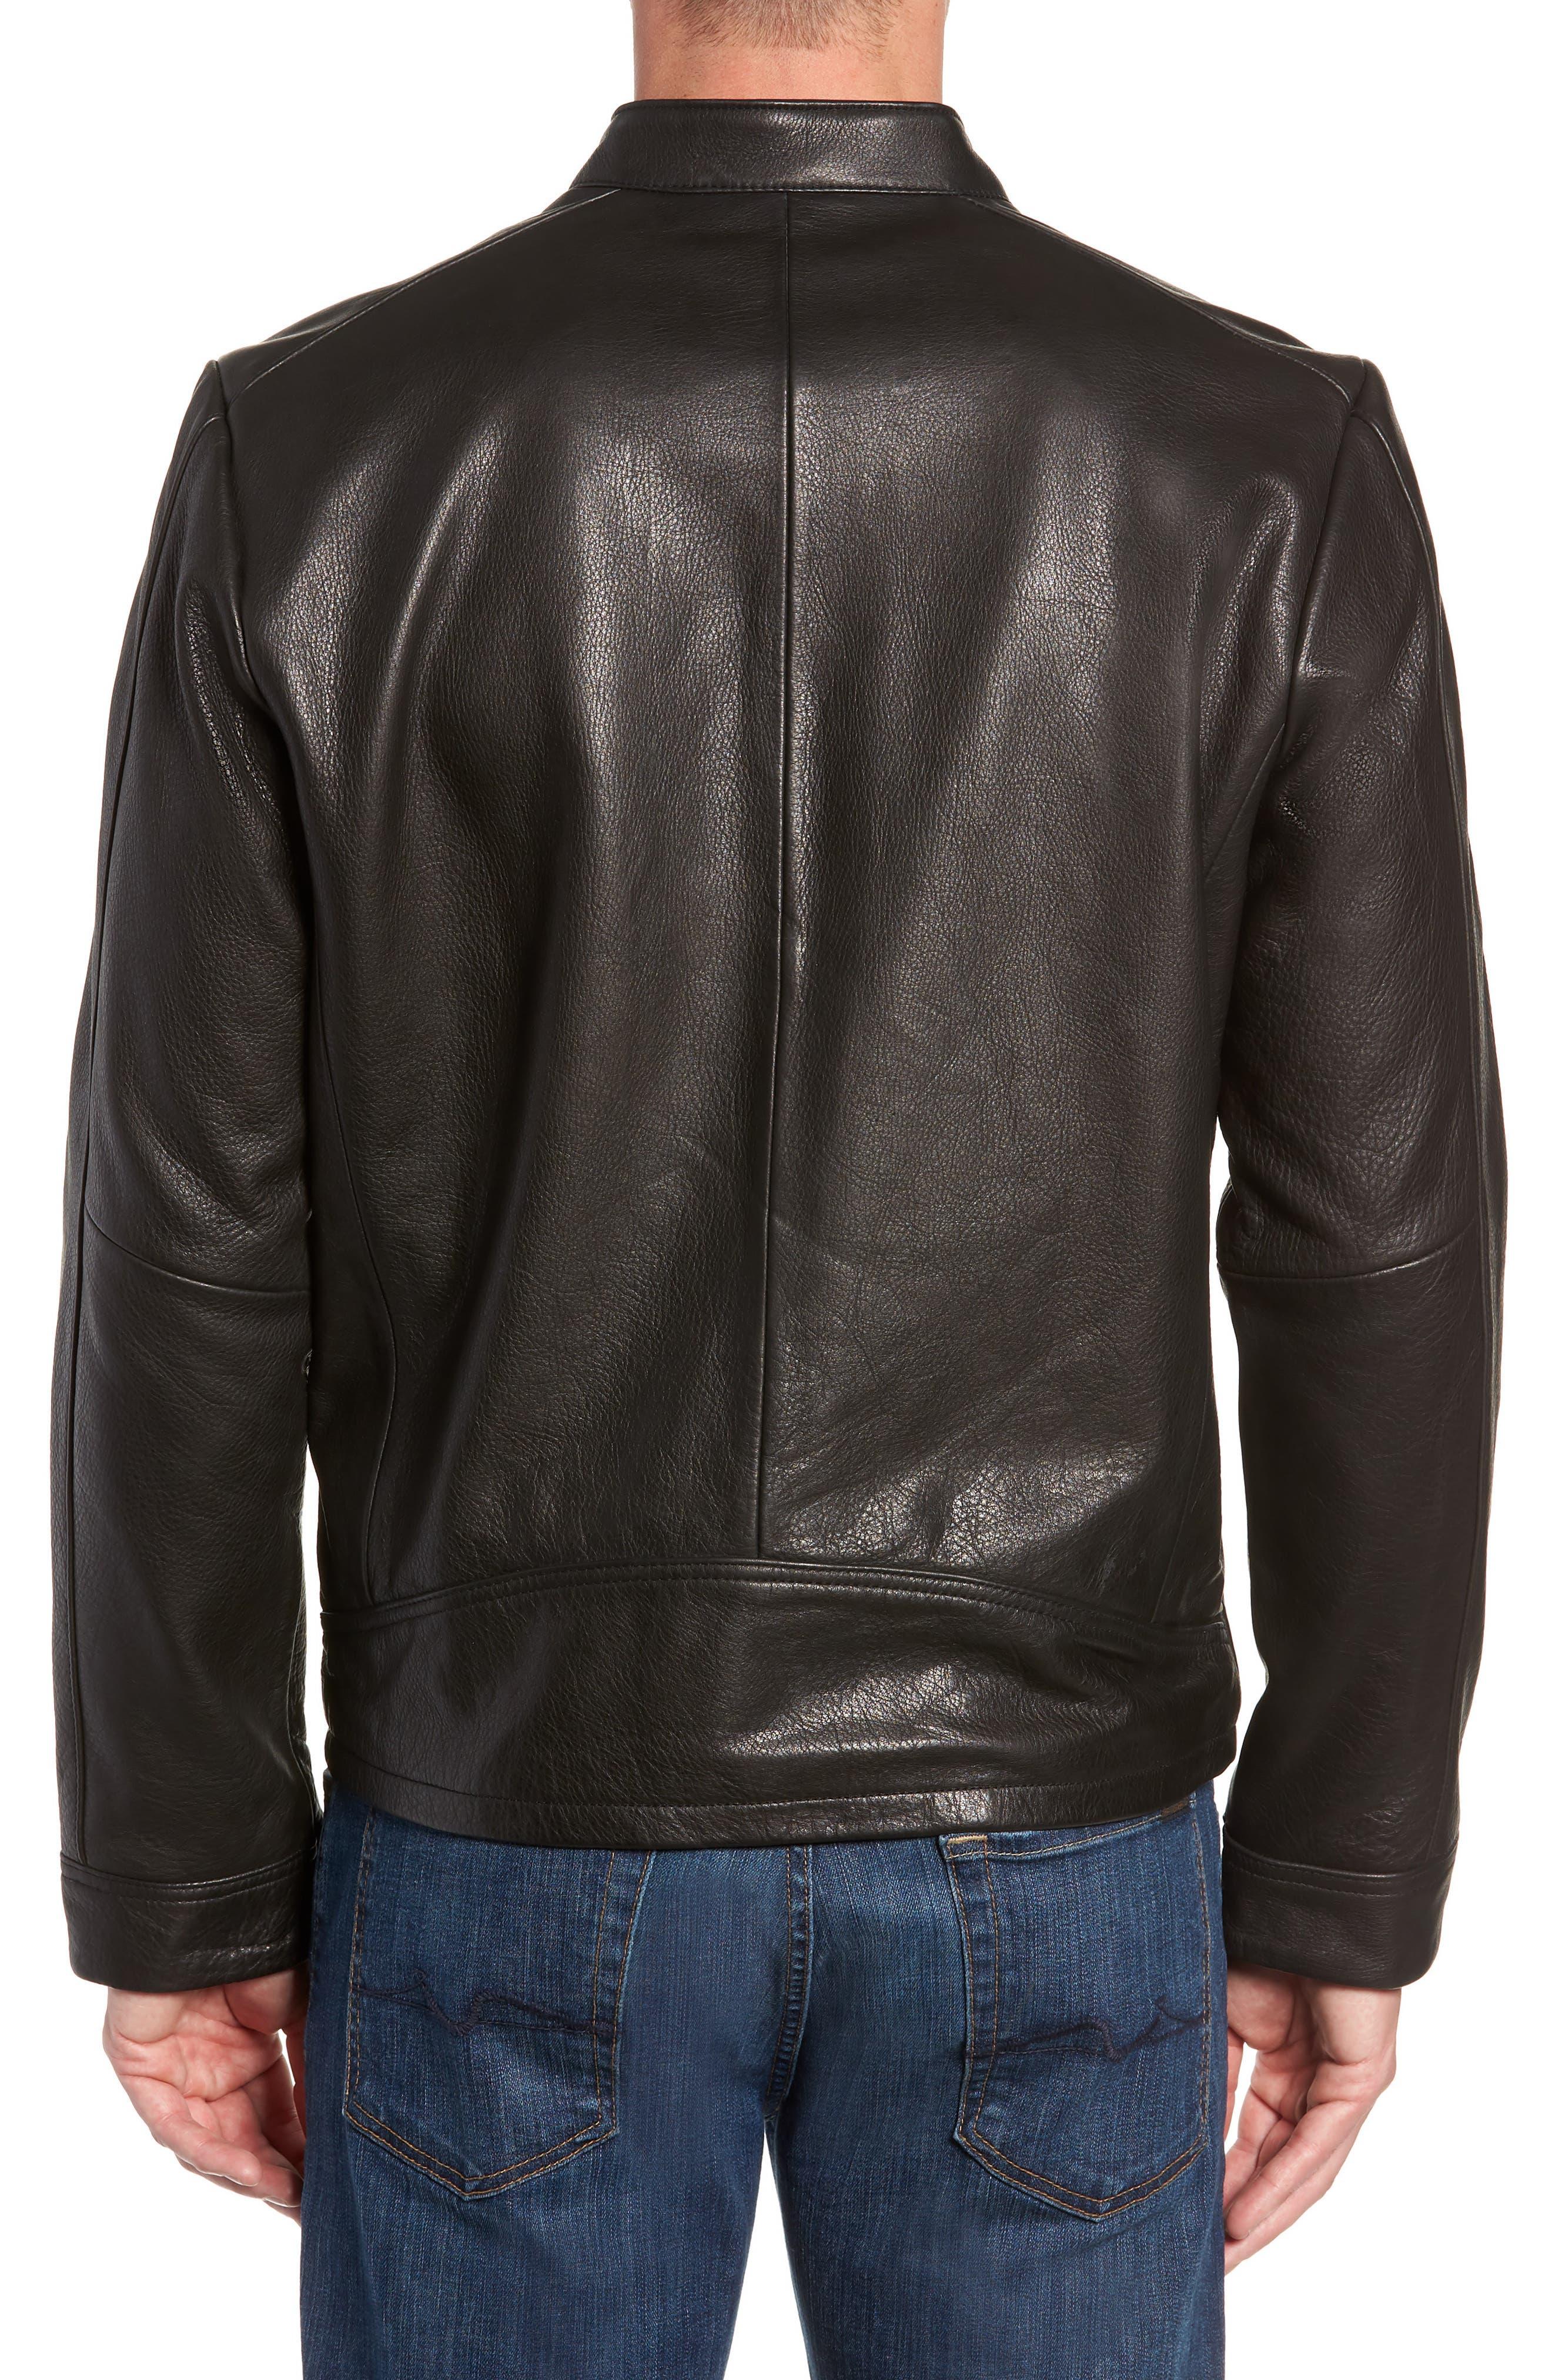 Orlando Leather Racer Coat,                             Alternate thumbnail 2, color,                             BLACK